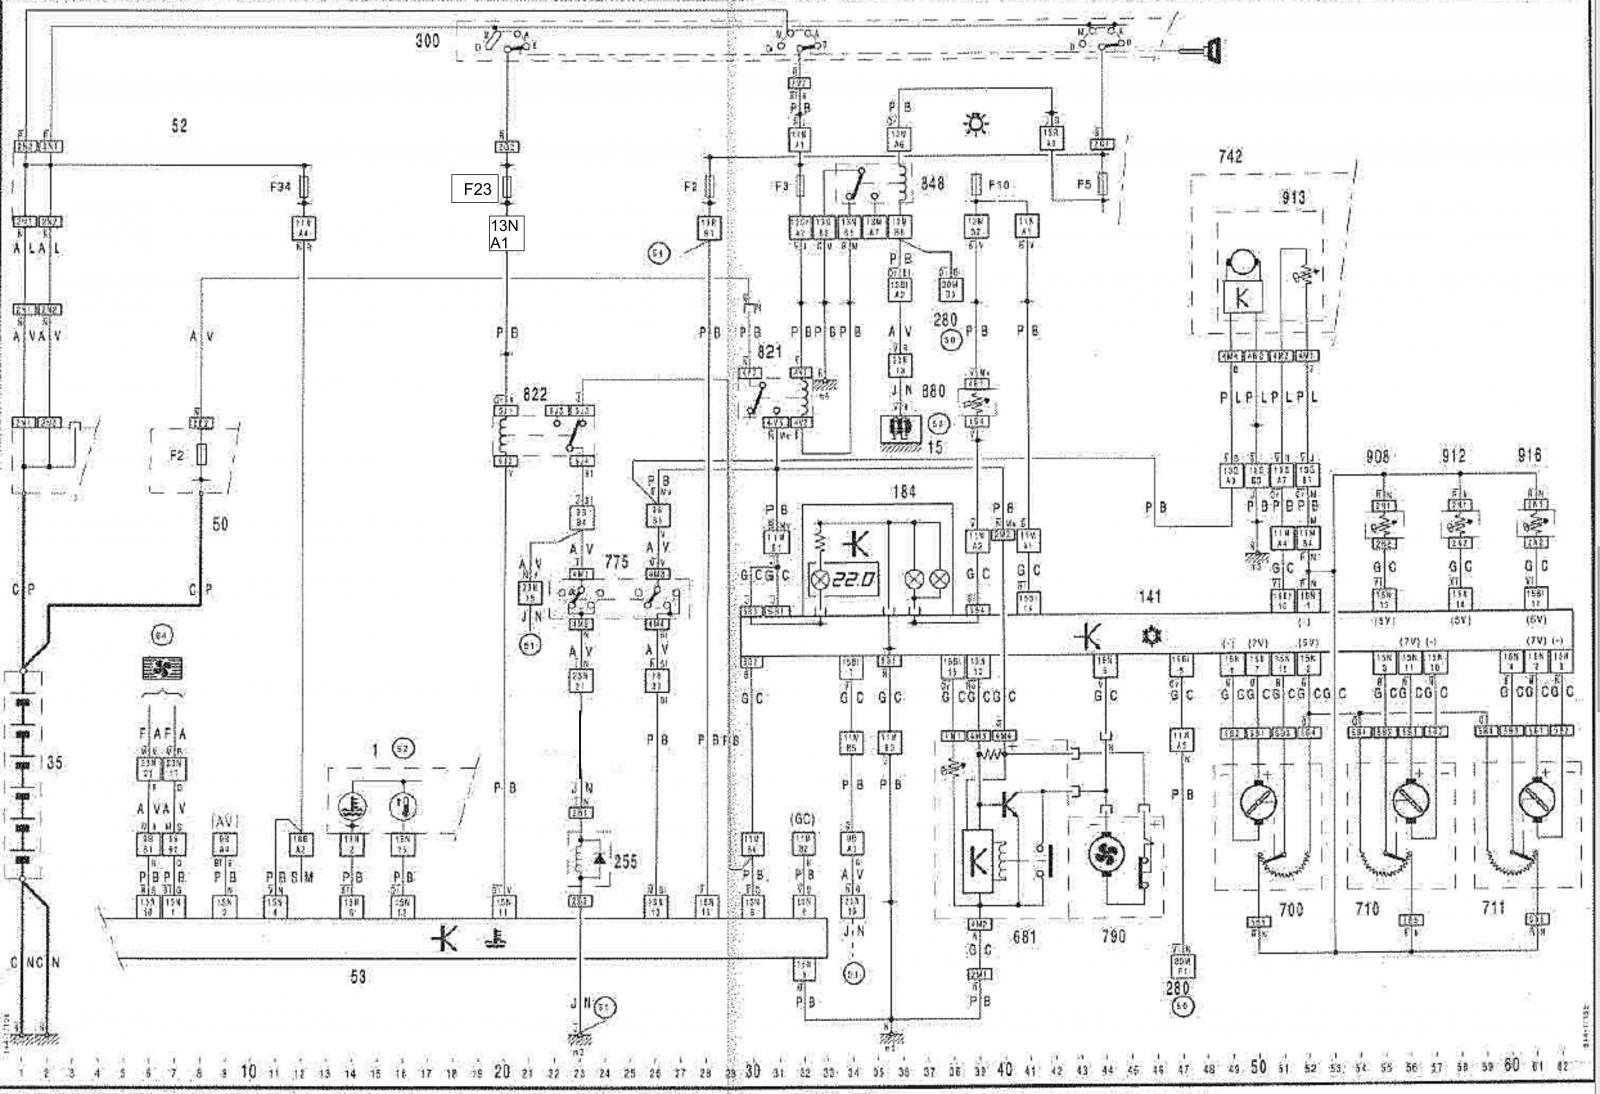 Tolle Citroen Relais Schaltplan Fotos - Schaltplan Serie Circuit ...